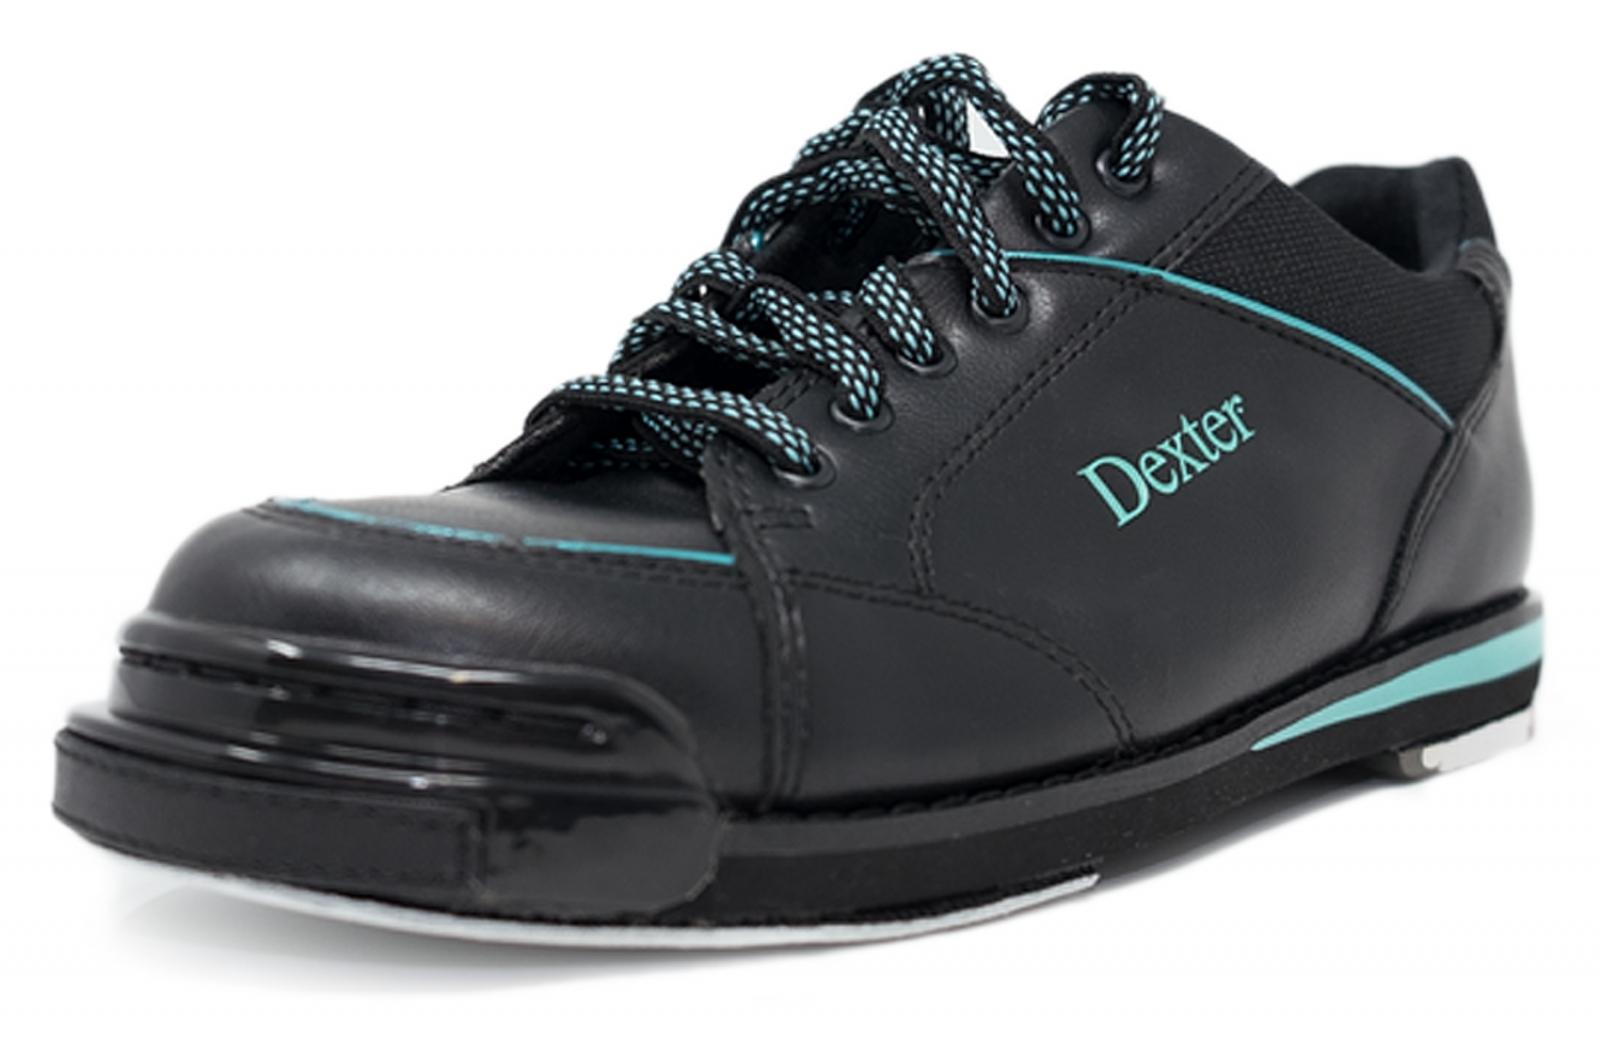 3a9ad79953d SST 8 Pro black turquoise. Dexter Womens SST 8 Pro black turquoise right  hand or left hand